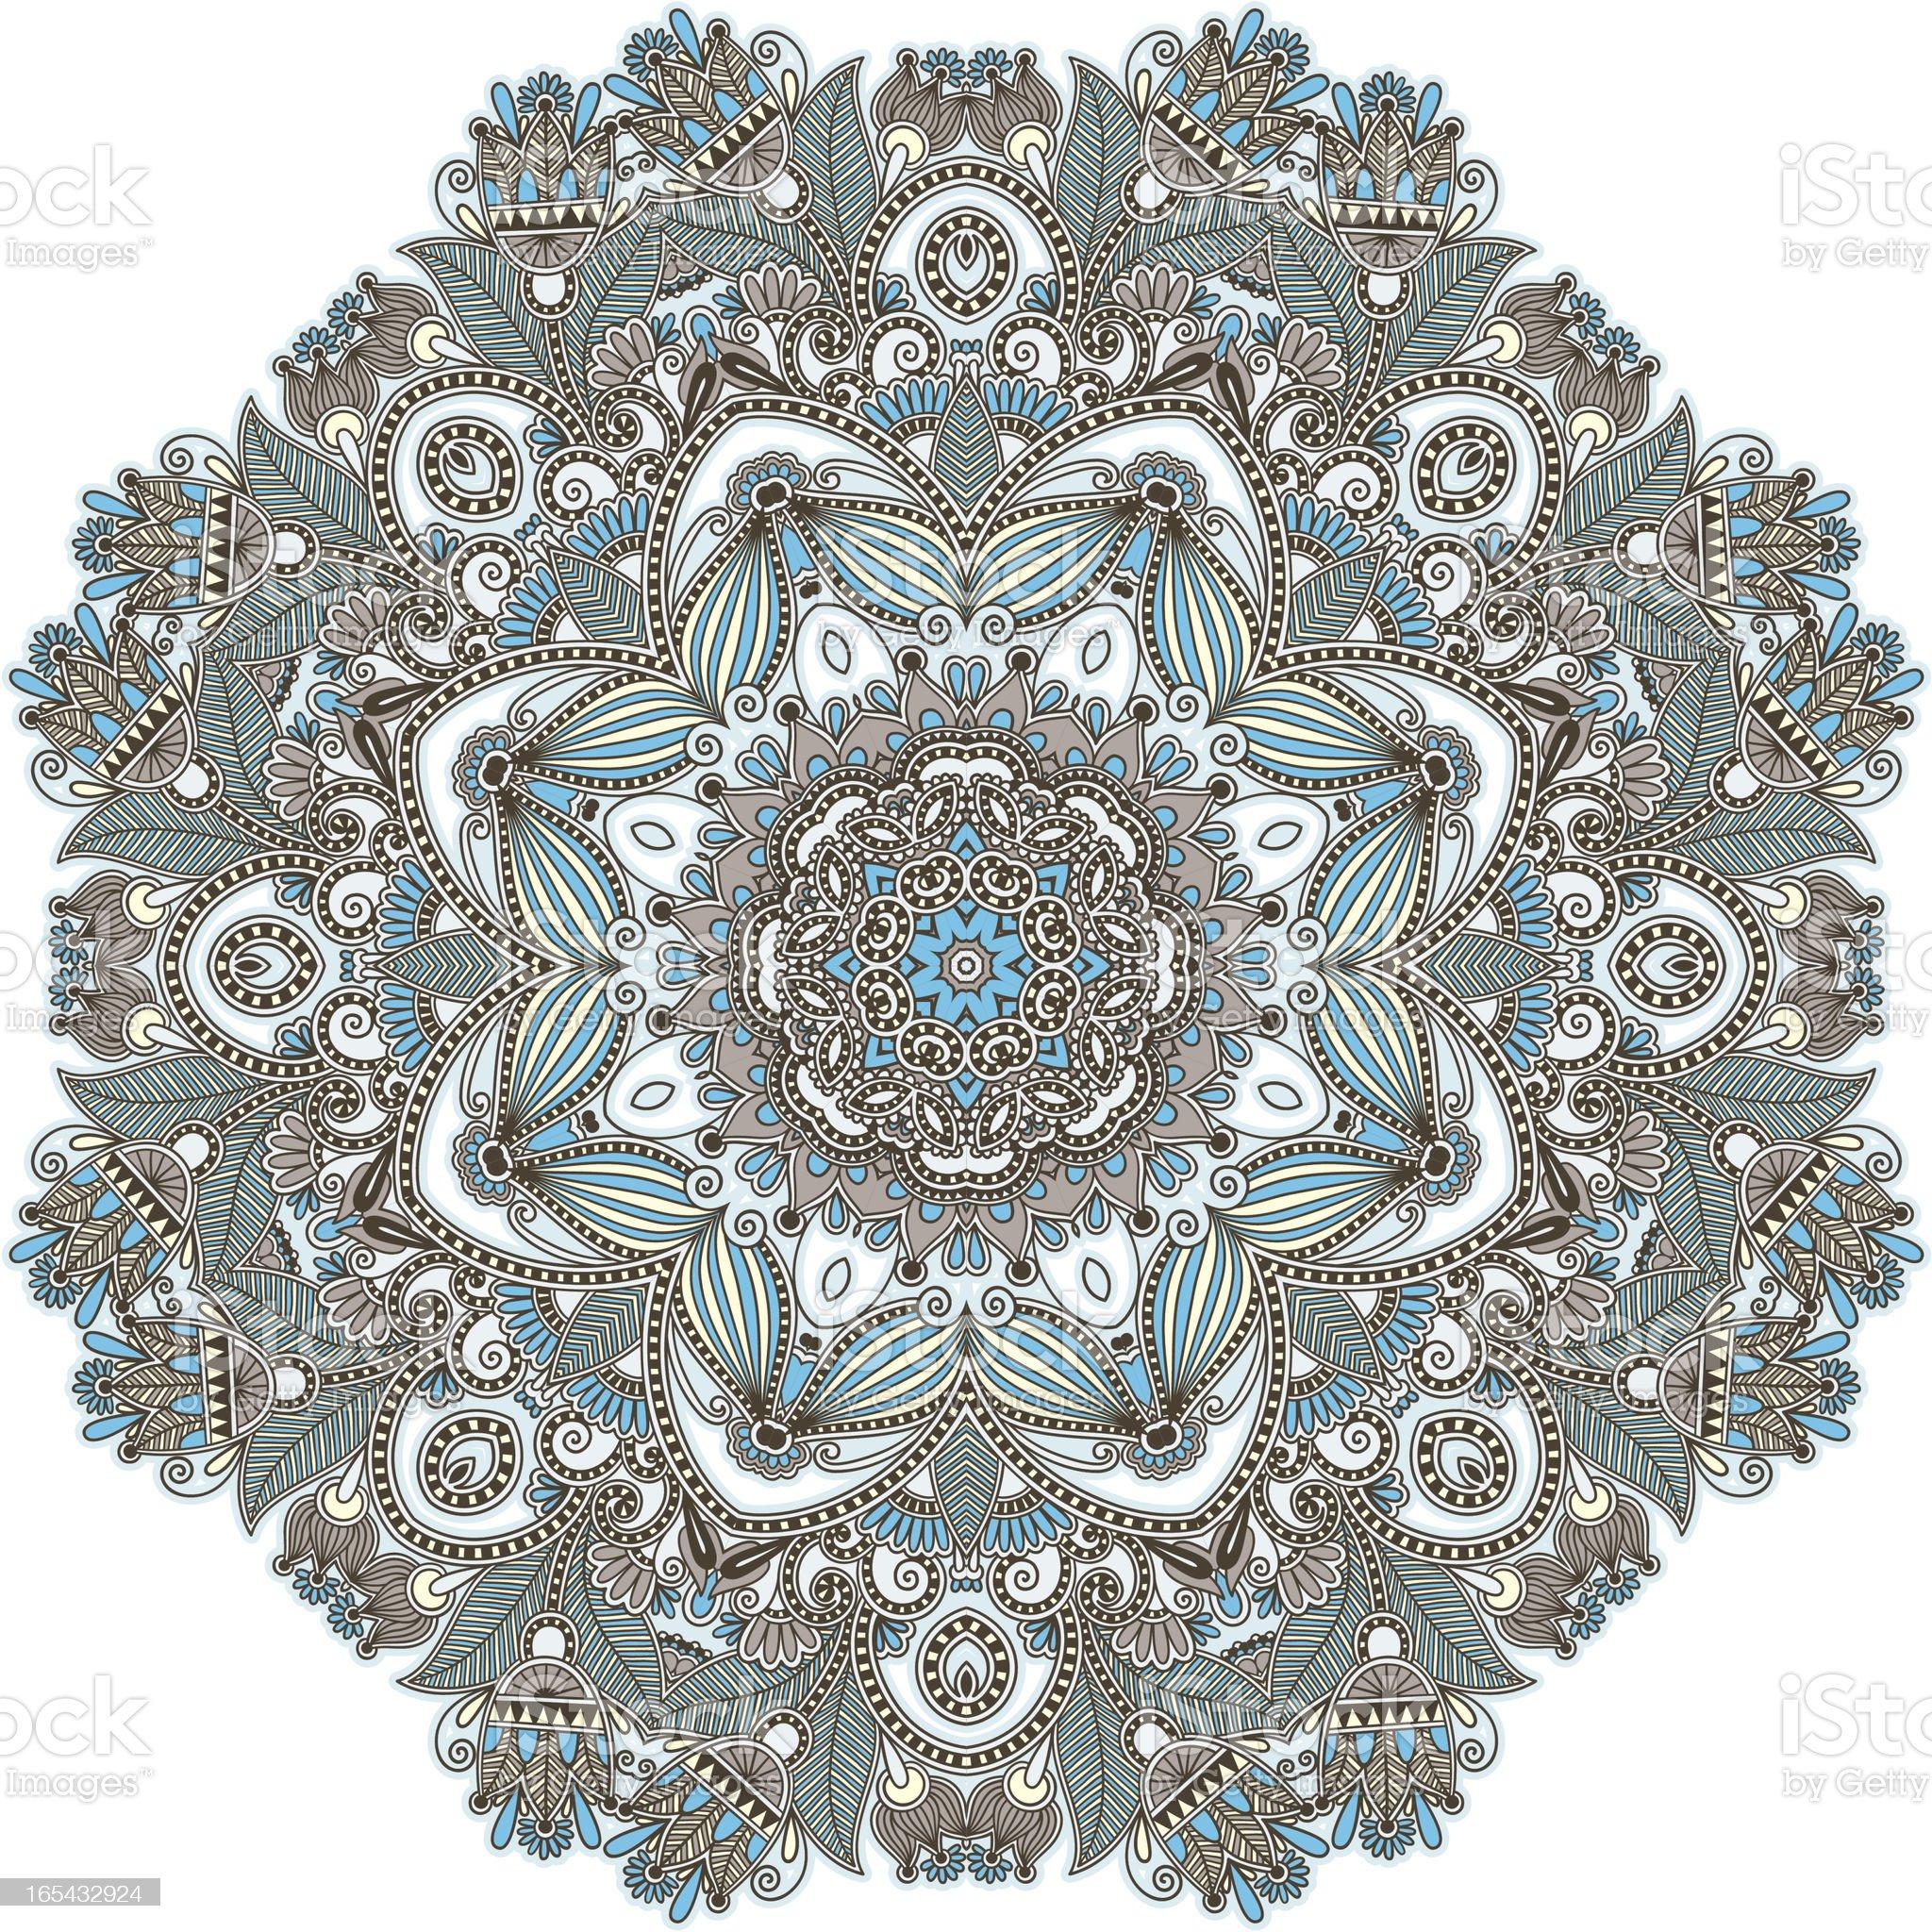 Circle ornament royalty-free stock vector art